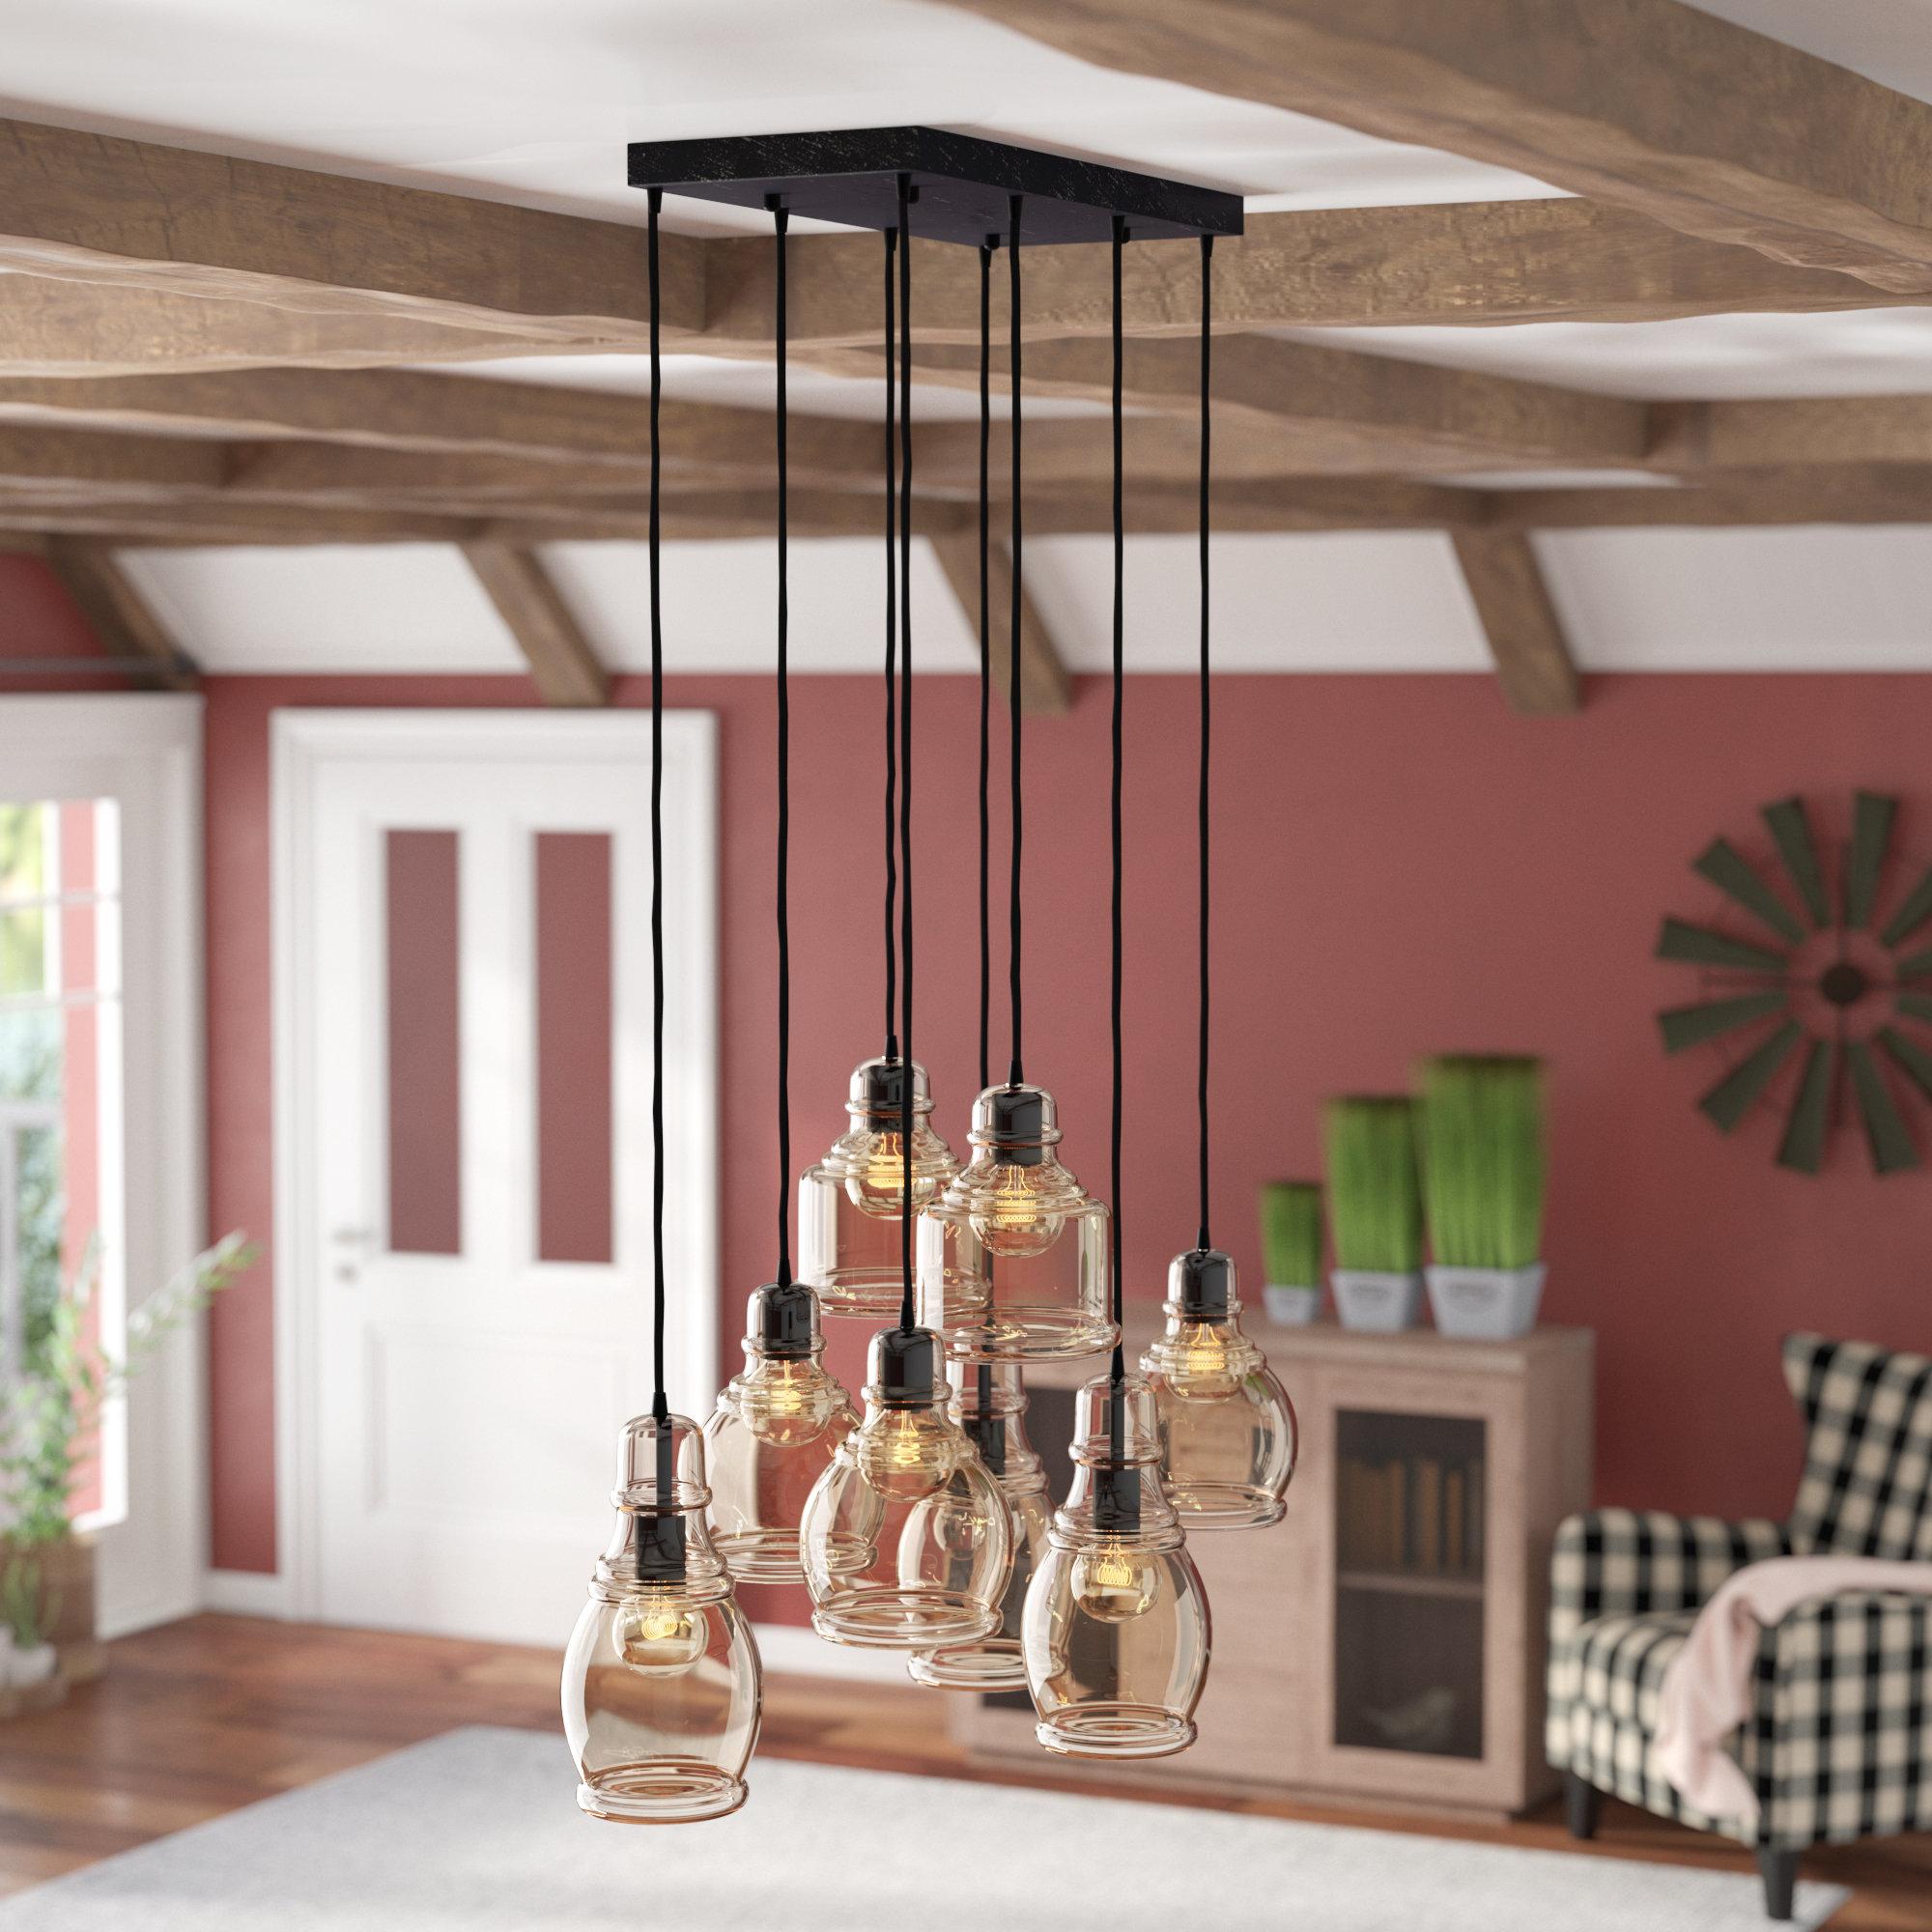 Pruett Cognac 3 Light Cluster Bell Pendants Within Current Pruett Cognac Glass 8 Light Cluster Pendant (View 17 of 20)